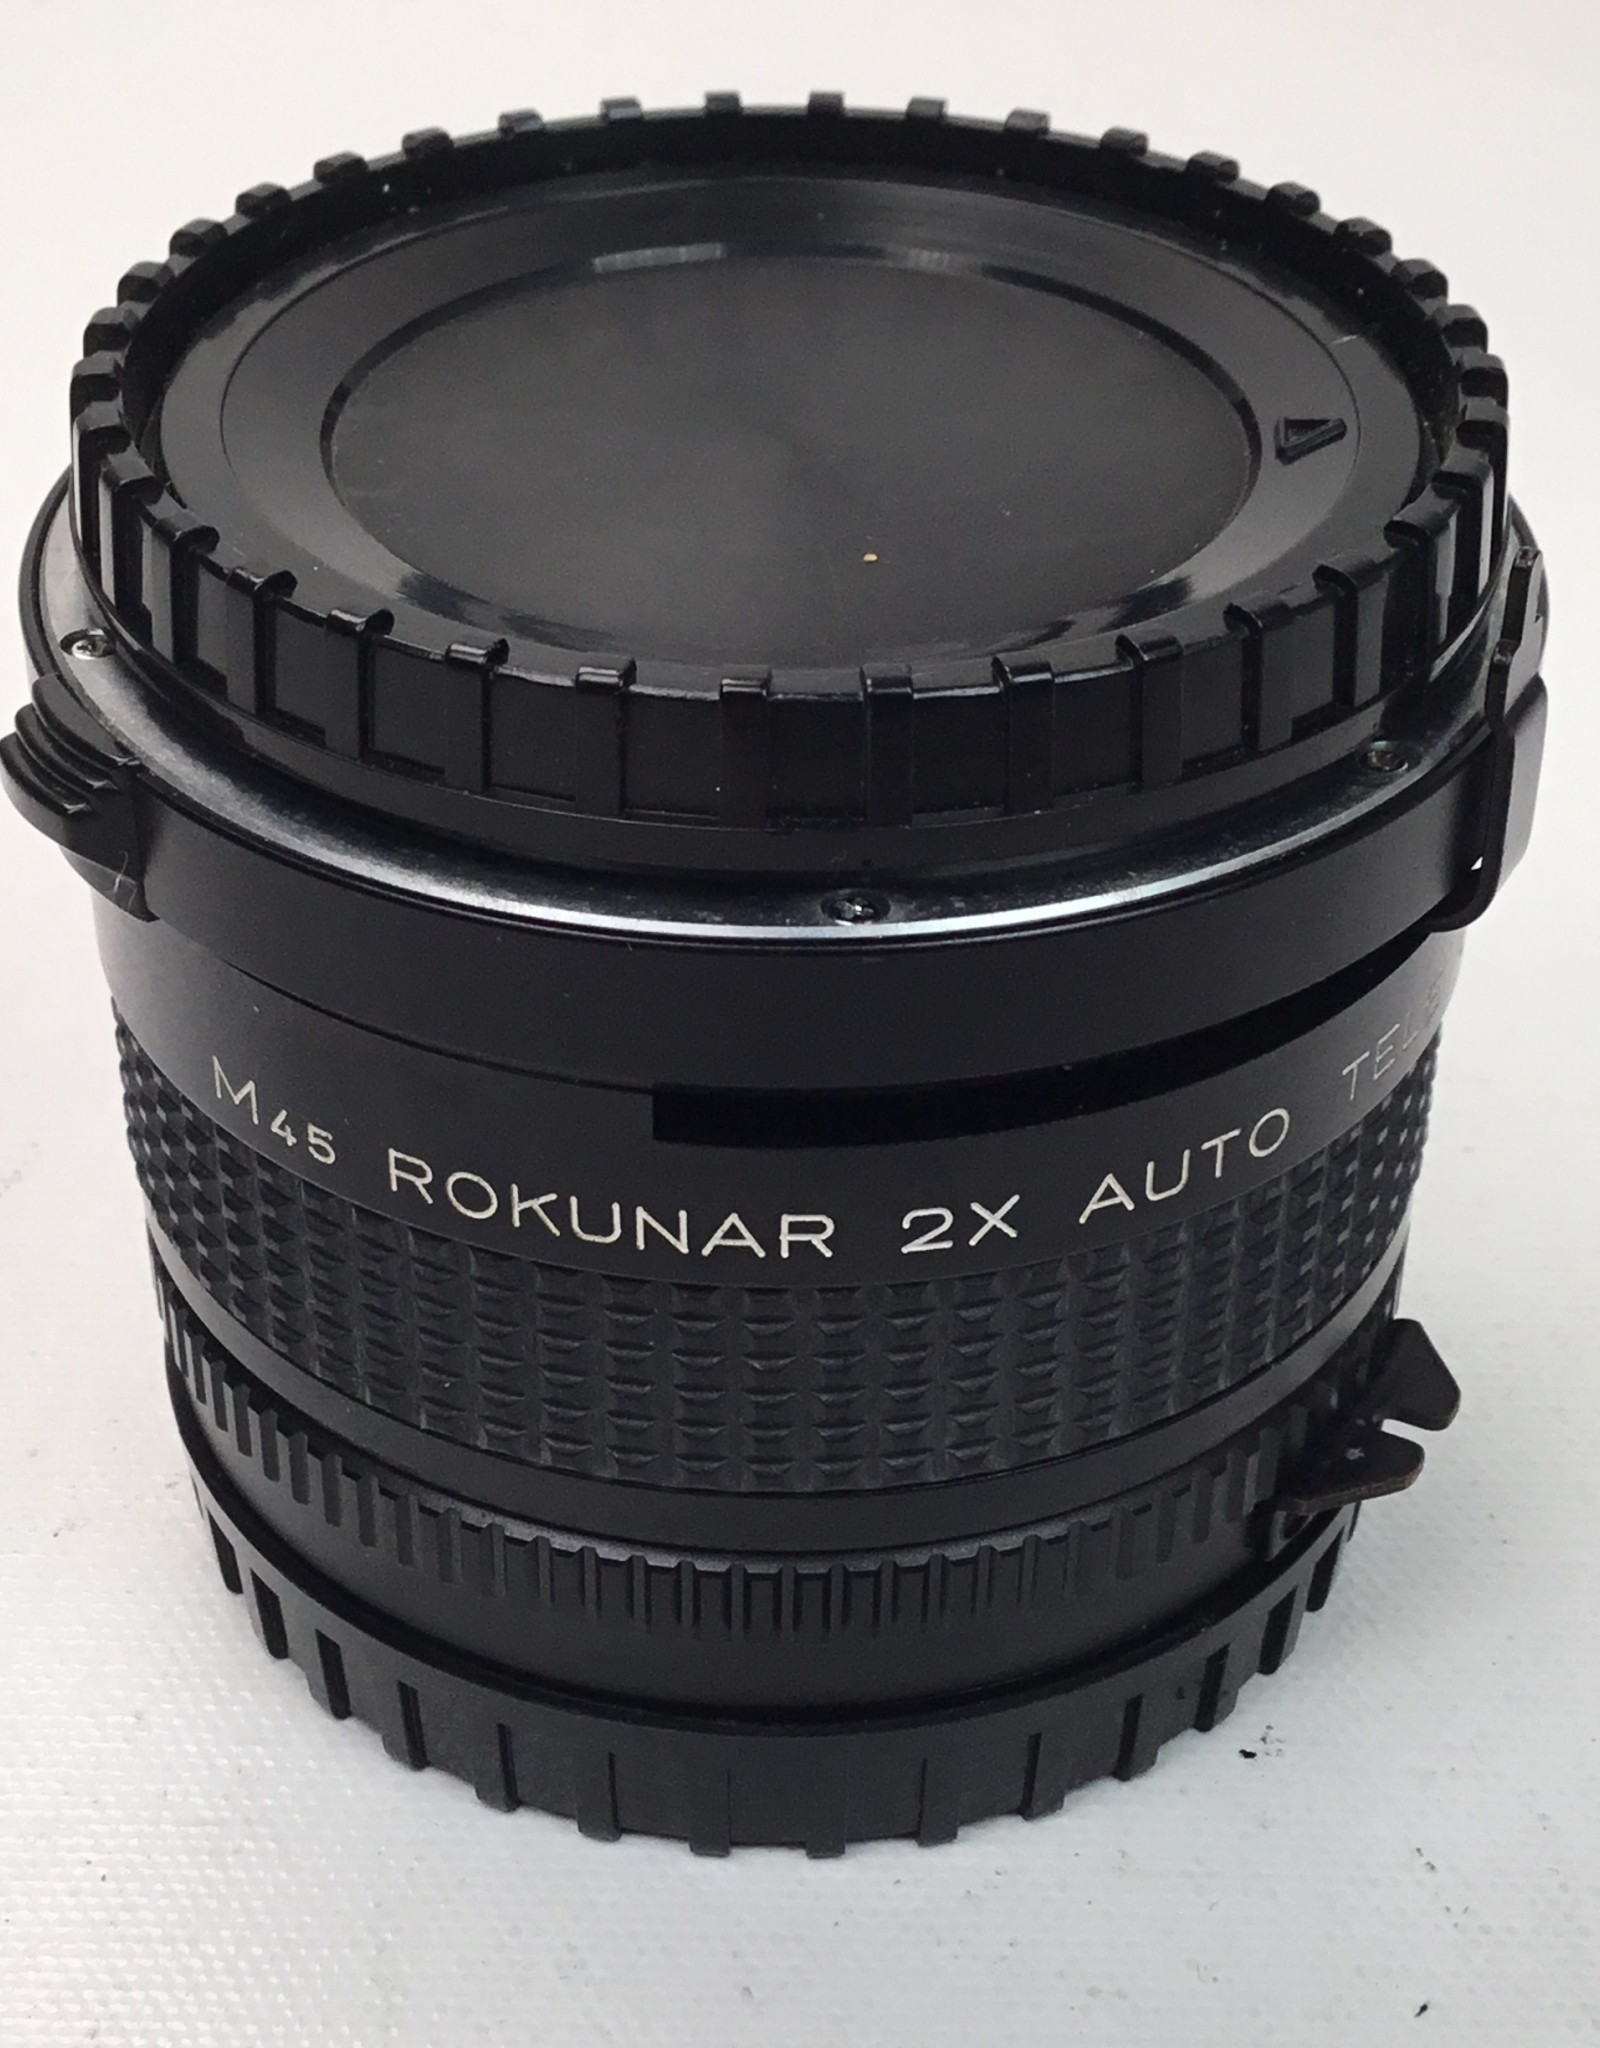 Rokunar 2x Teleconverter for Mamiya 645 Used EX